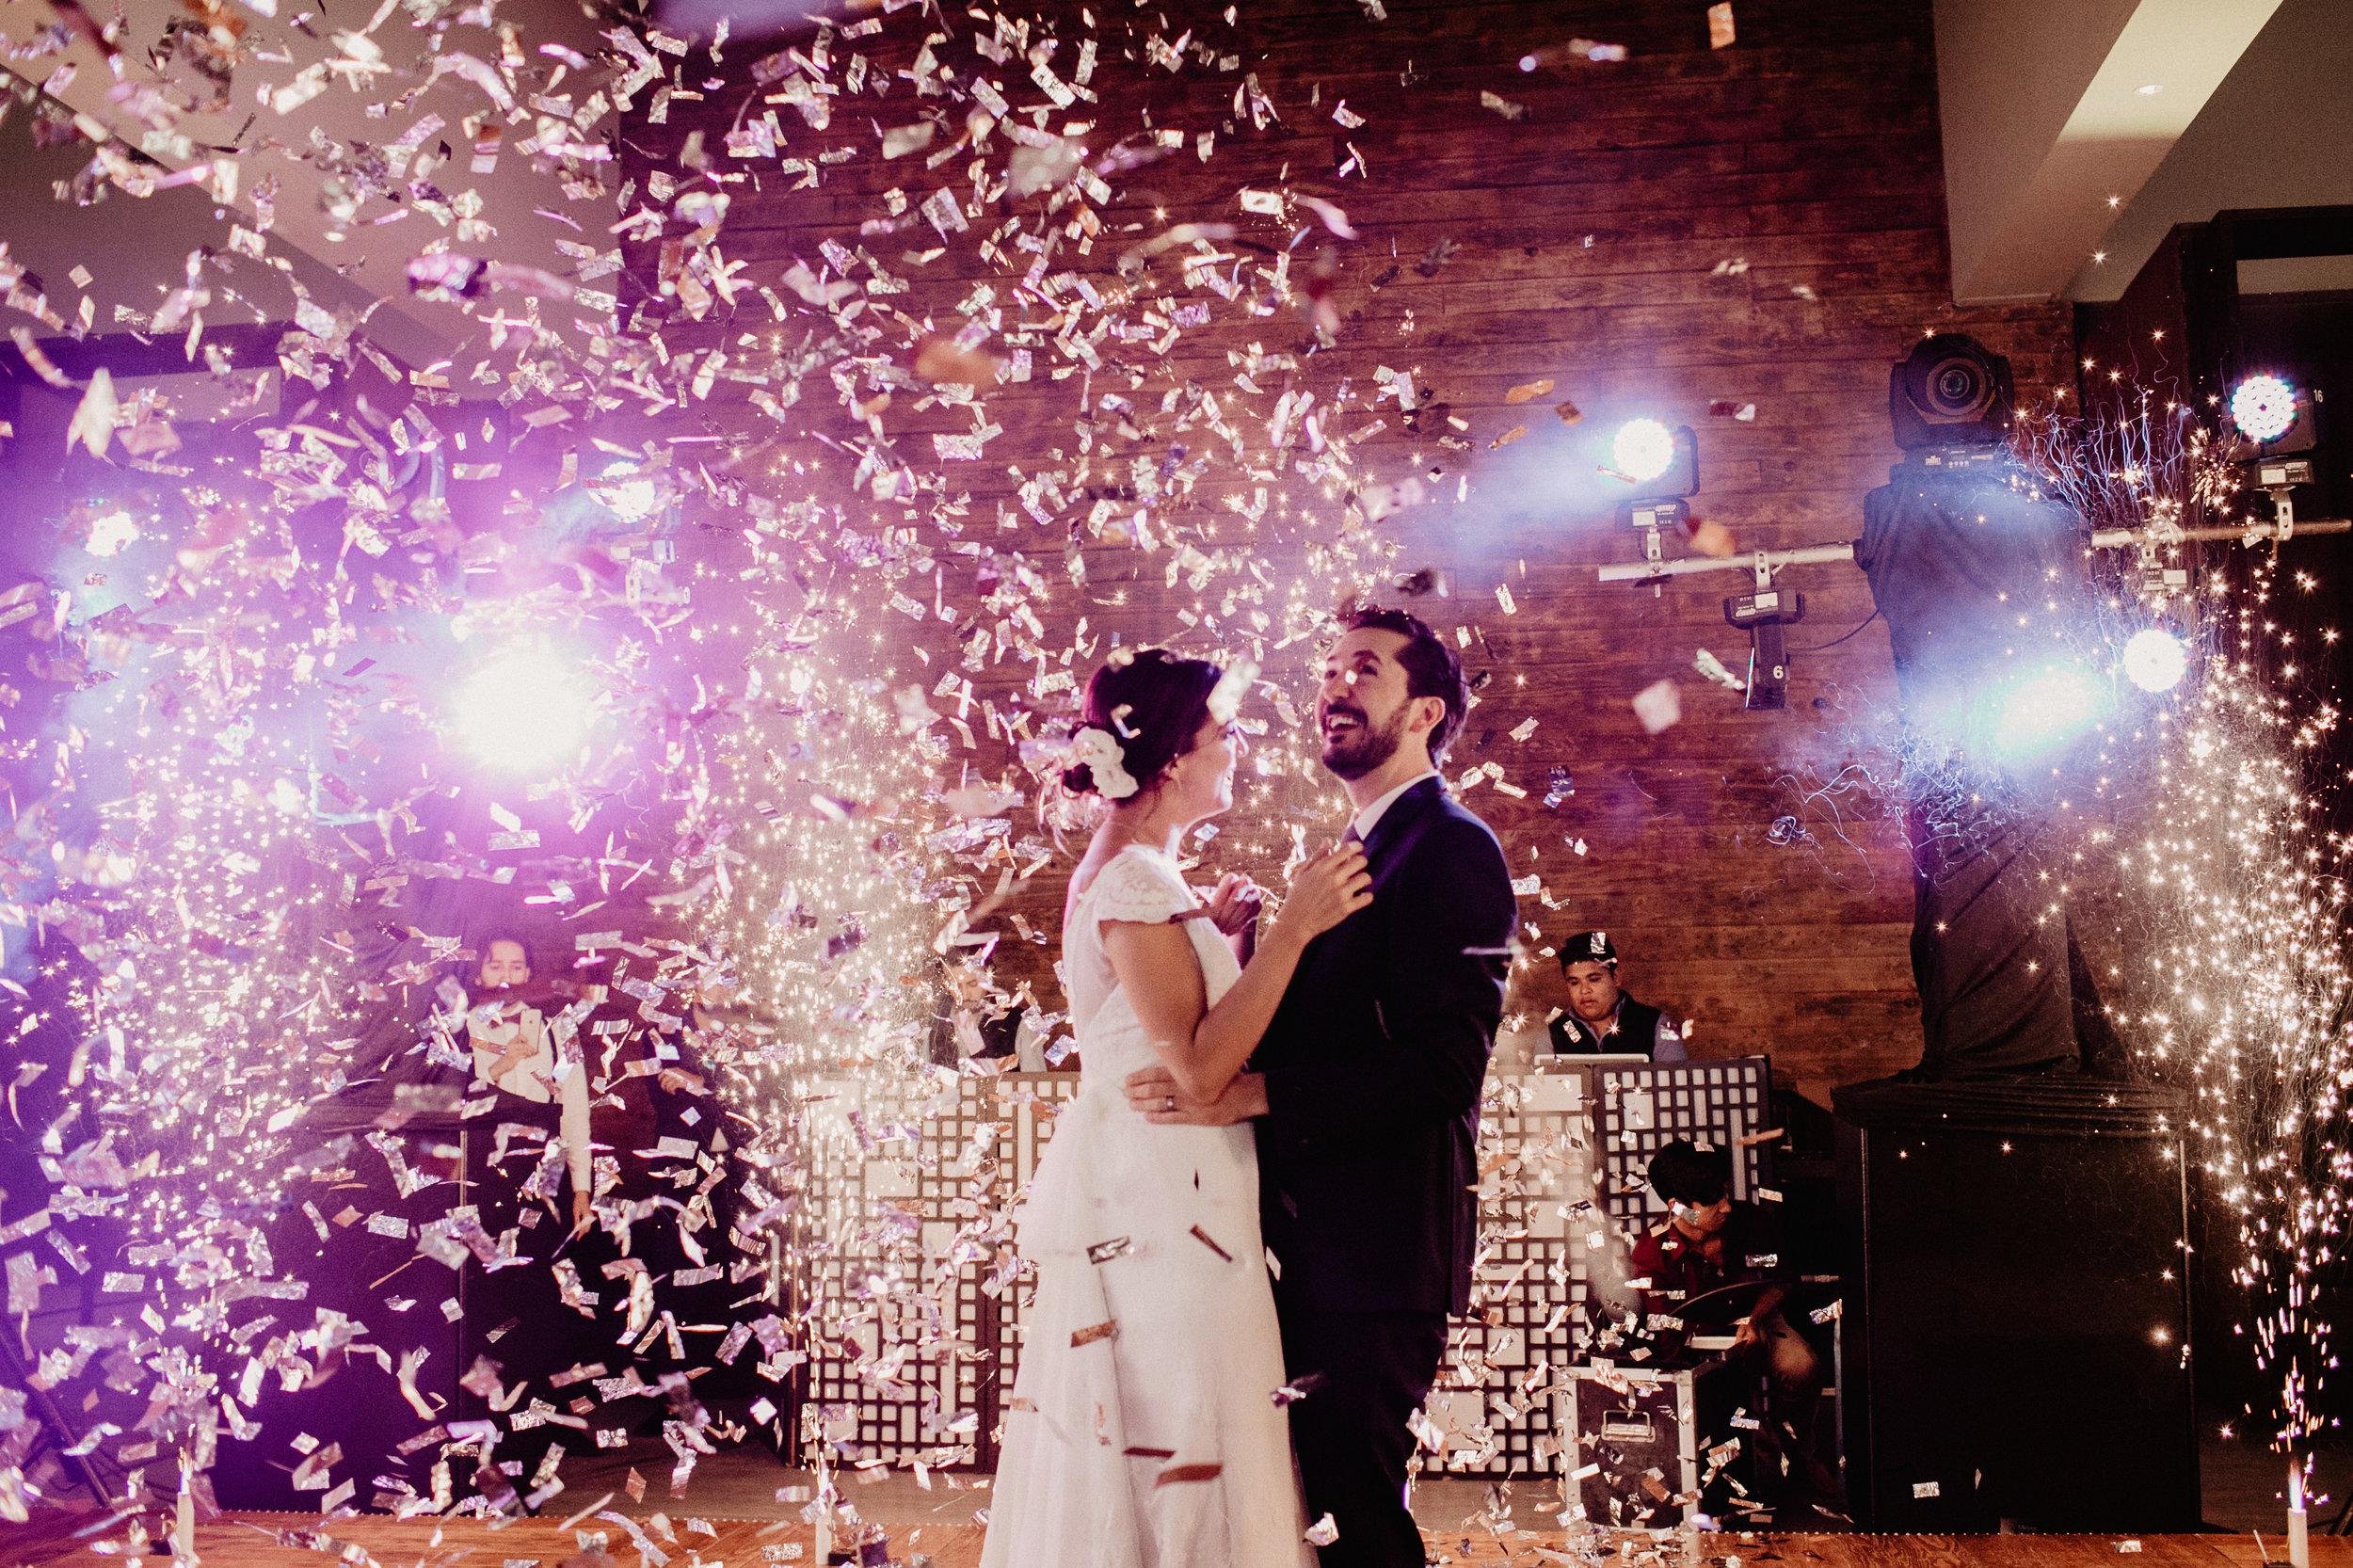 alfonso_flores_destination_wedding_photographer_pau_alonso_843.JPG